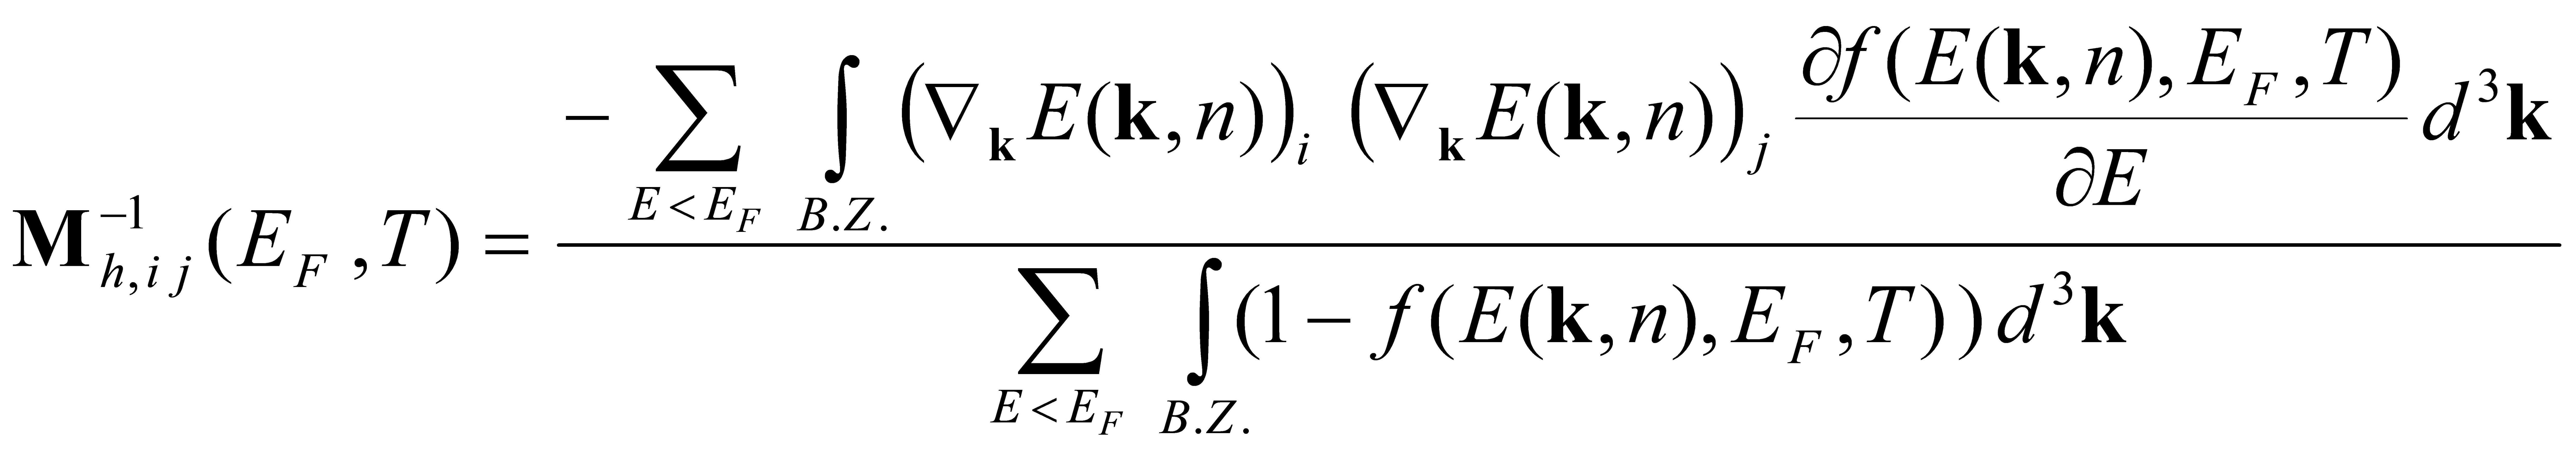 Figure 02_image007